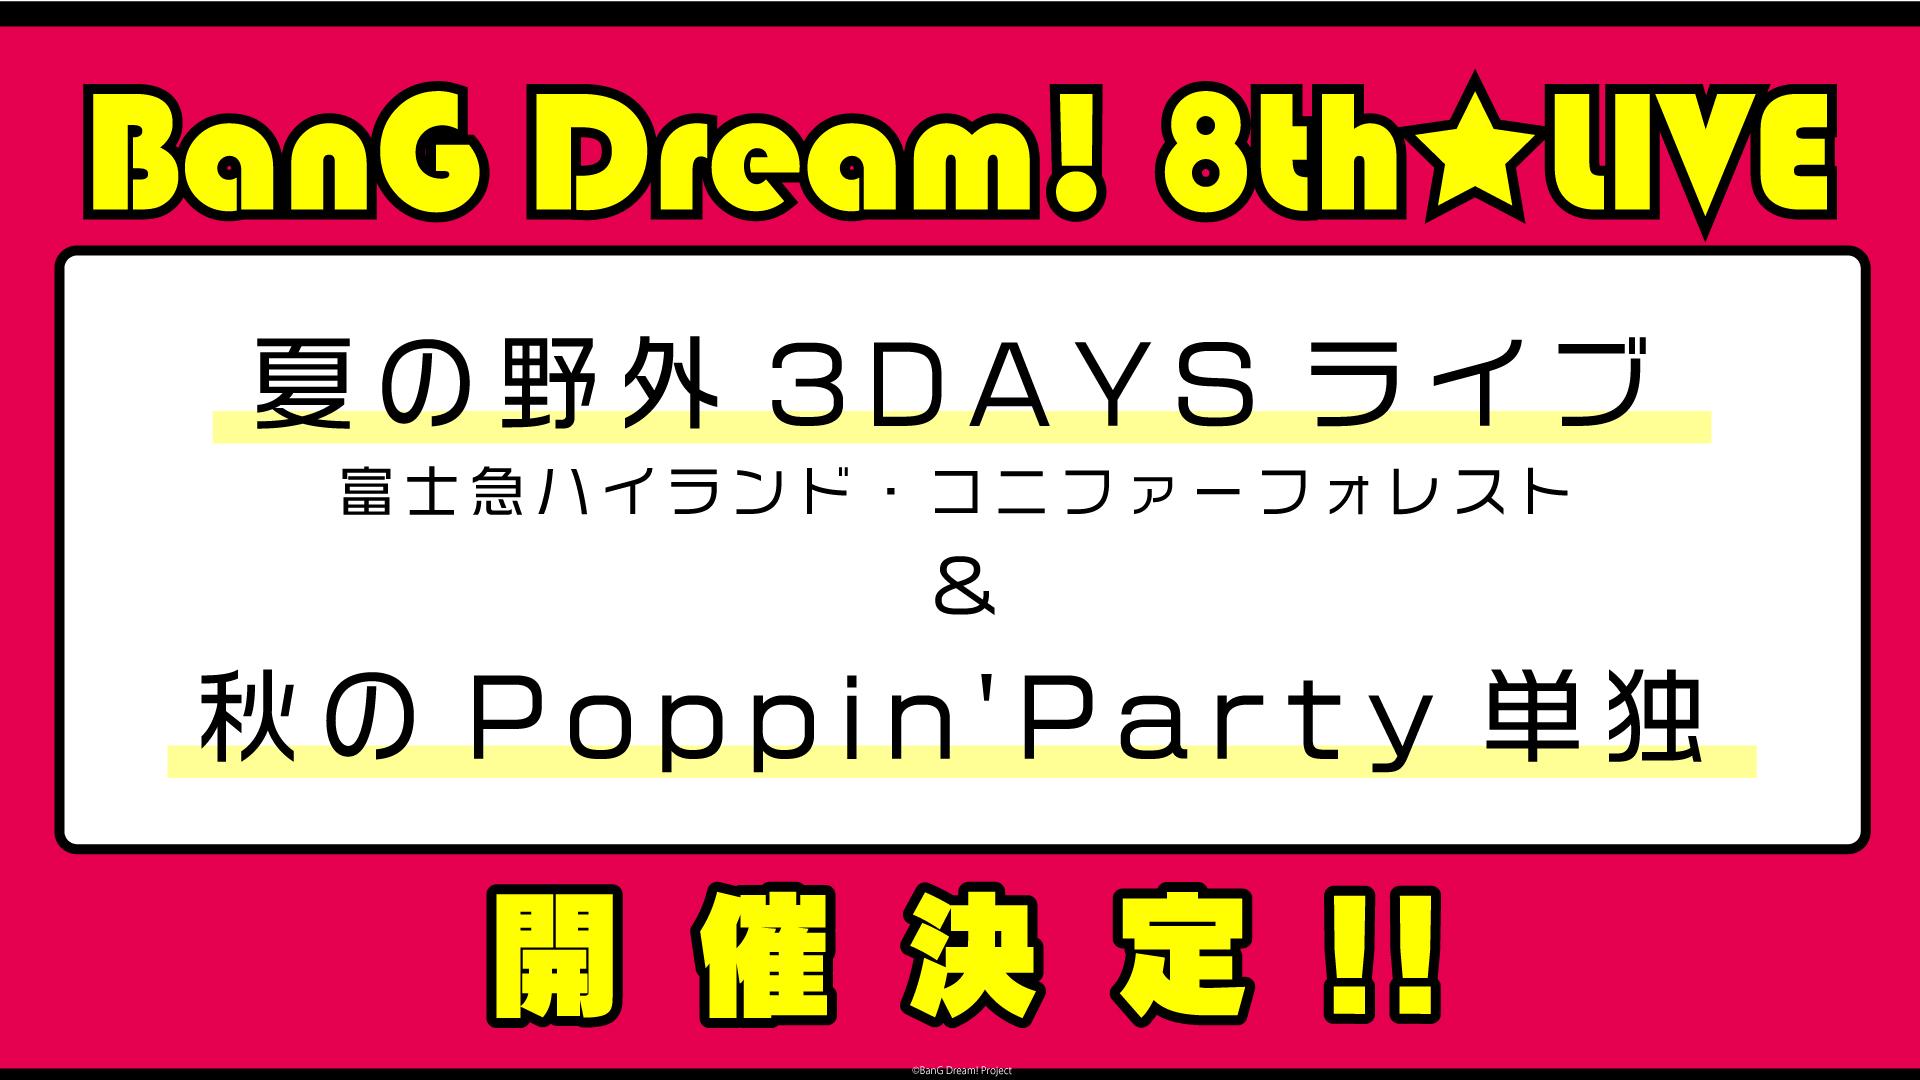 bang_dream_info 1201081987638775808_p0